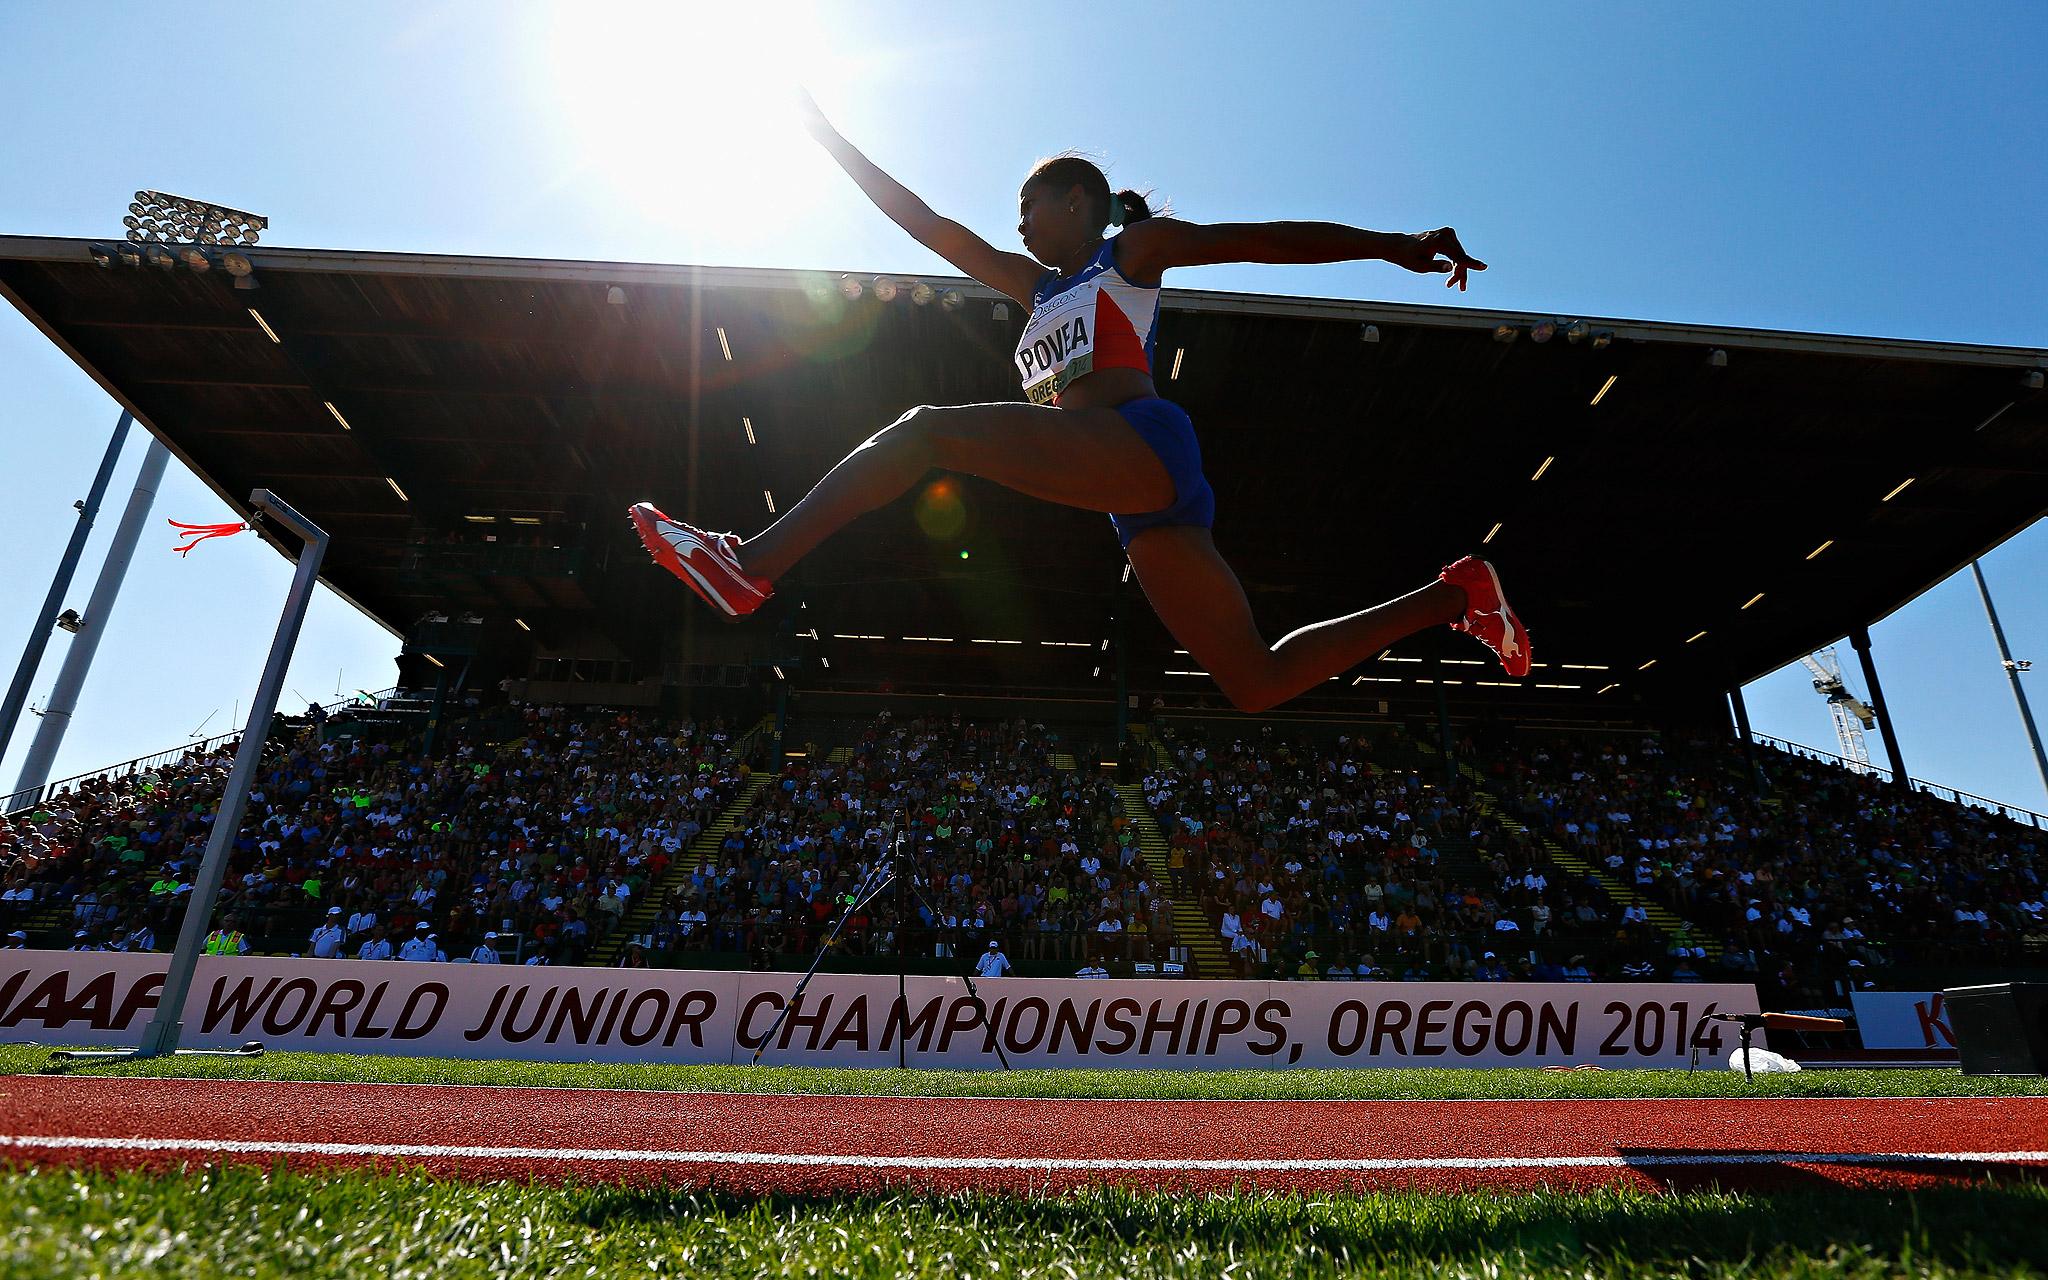 IAAF Junior World Championships